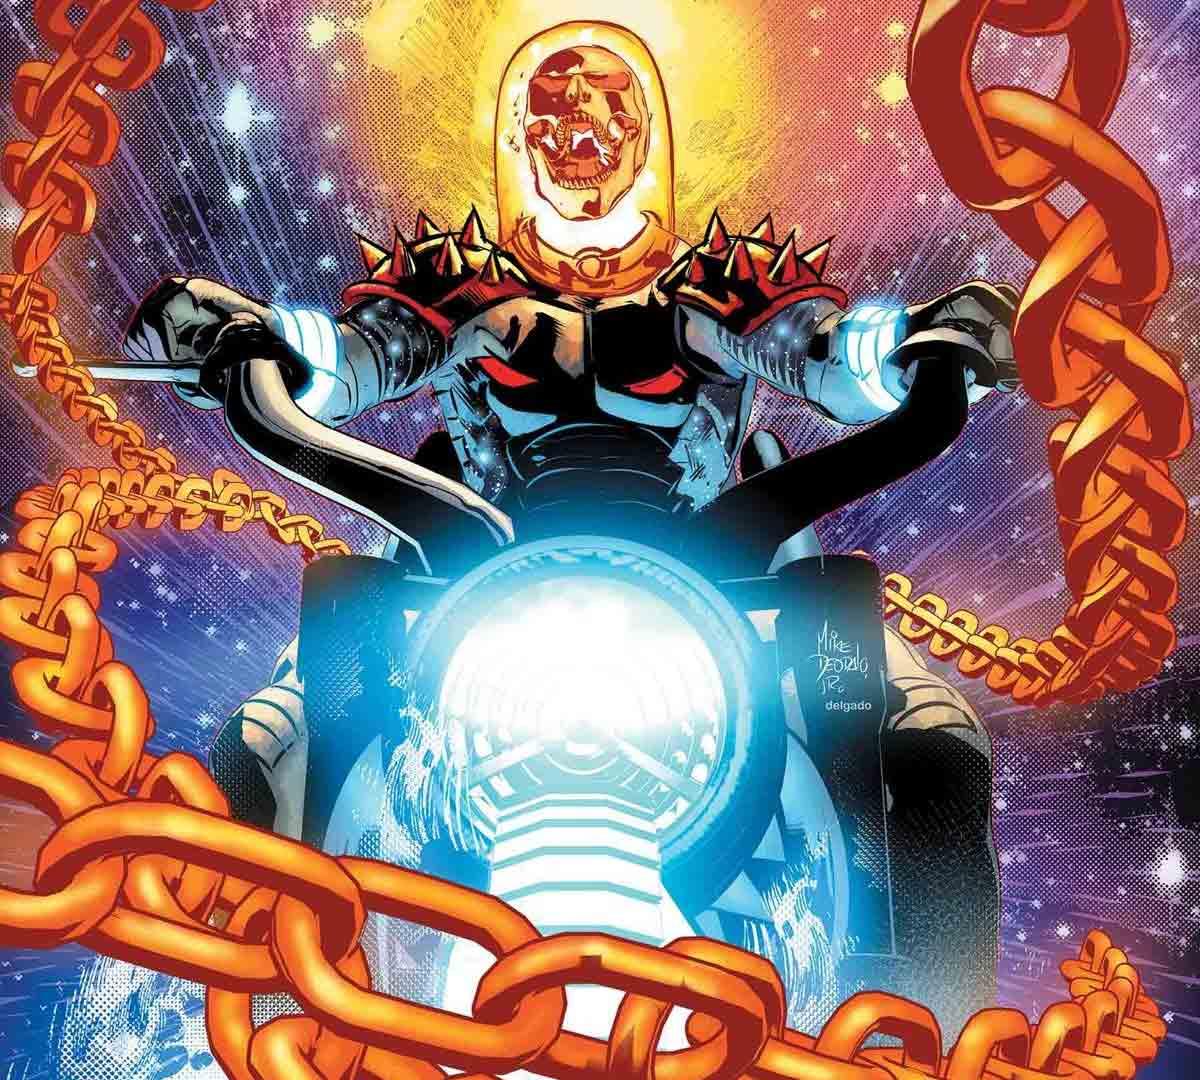 Golem-Comics-motorista-fantasma-cosmico-el-bebe-thanos-debe-morir-03